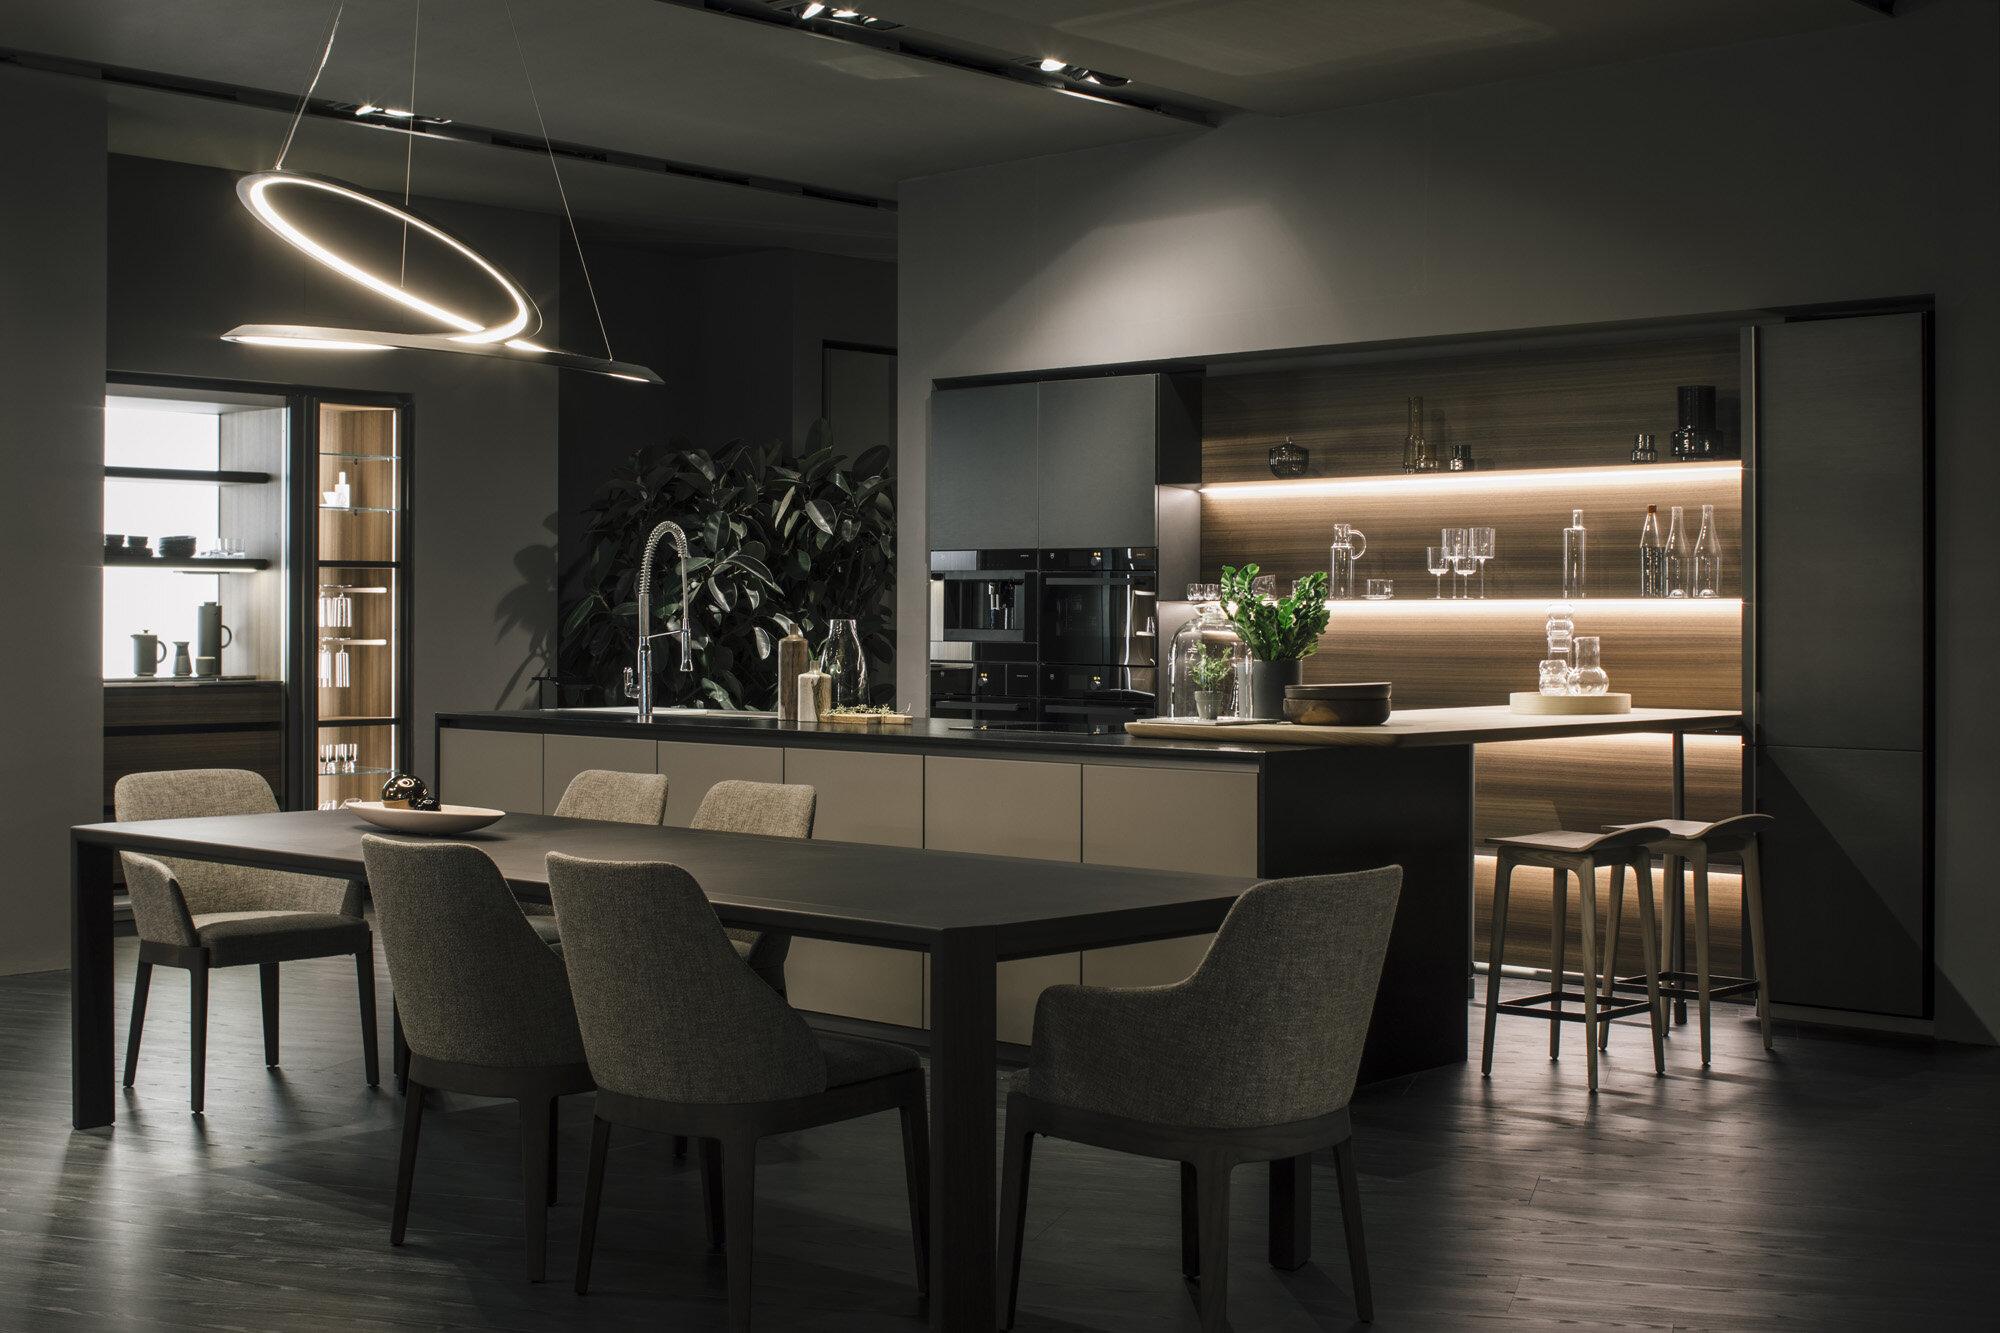 P5 Furniture - Molteni C & Dada20.jpg